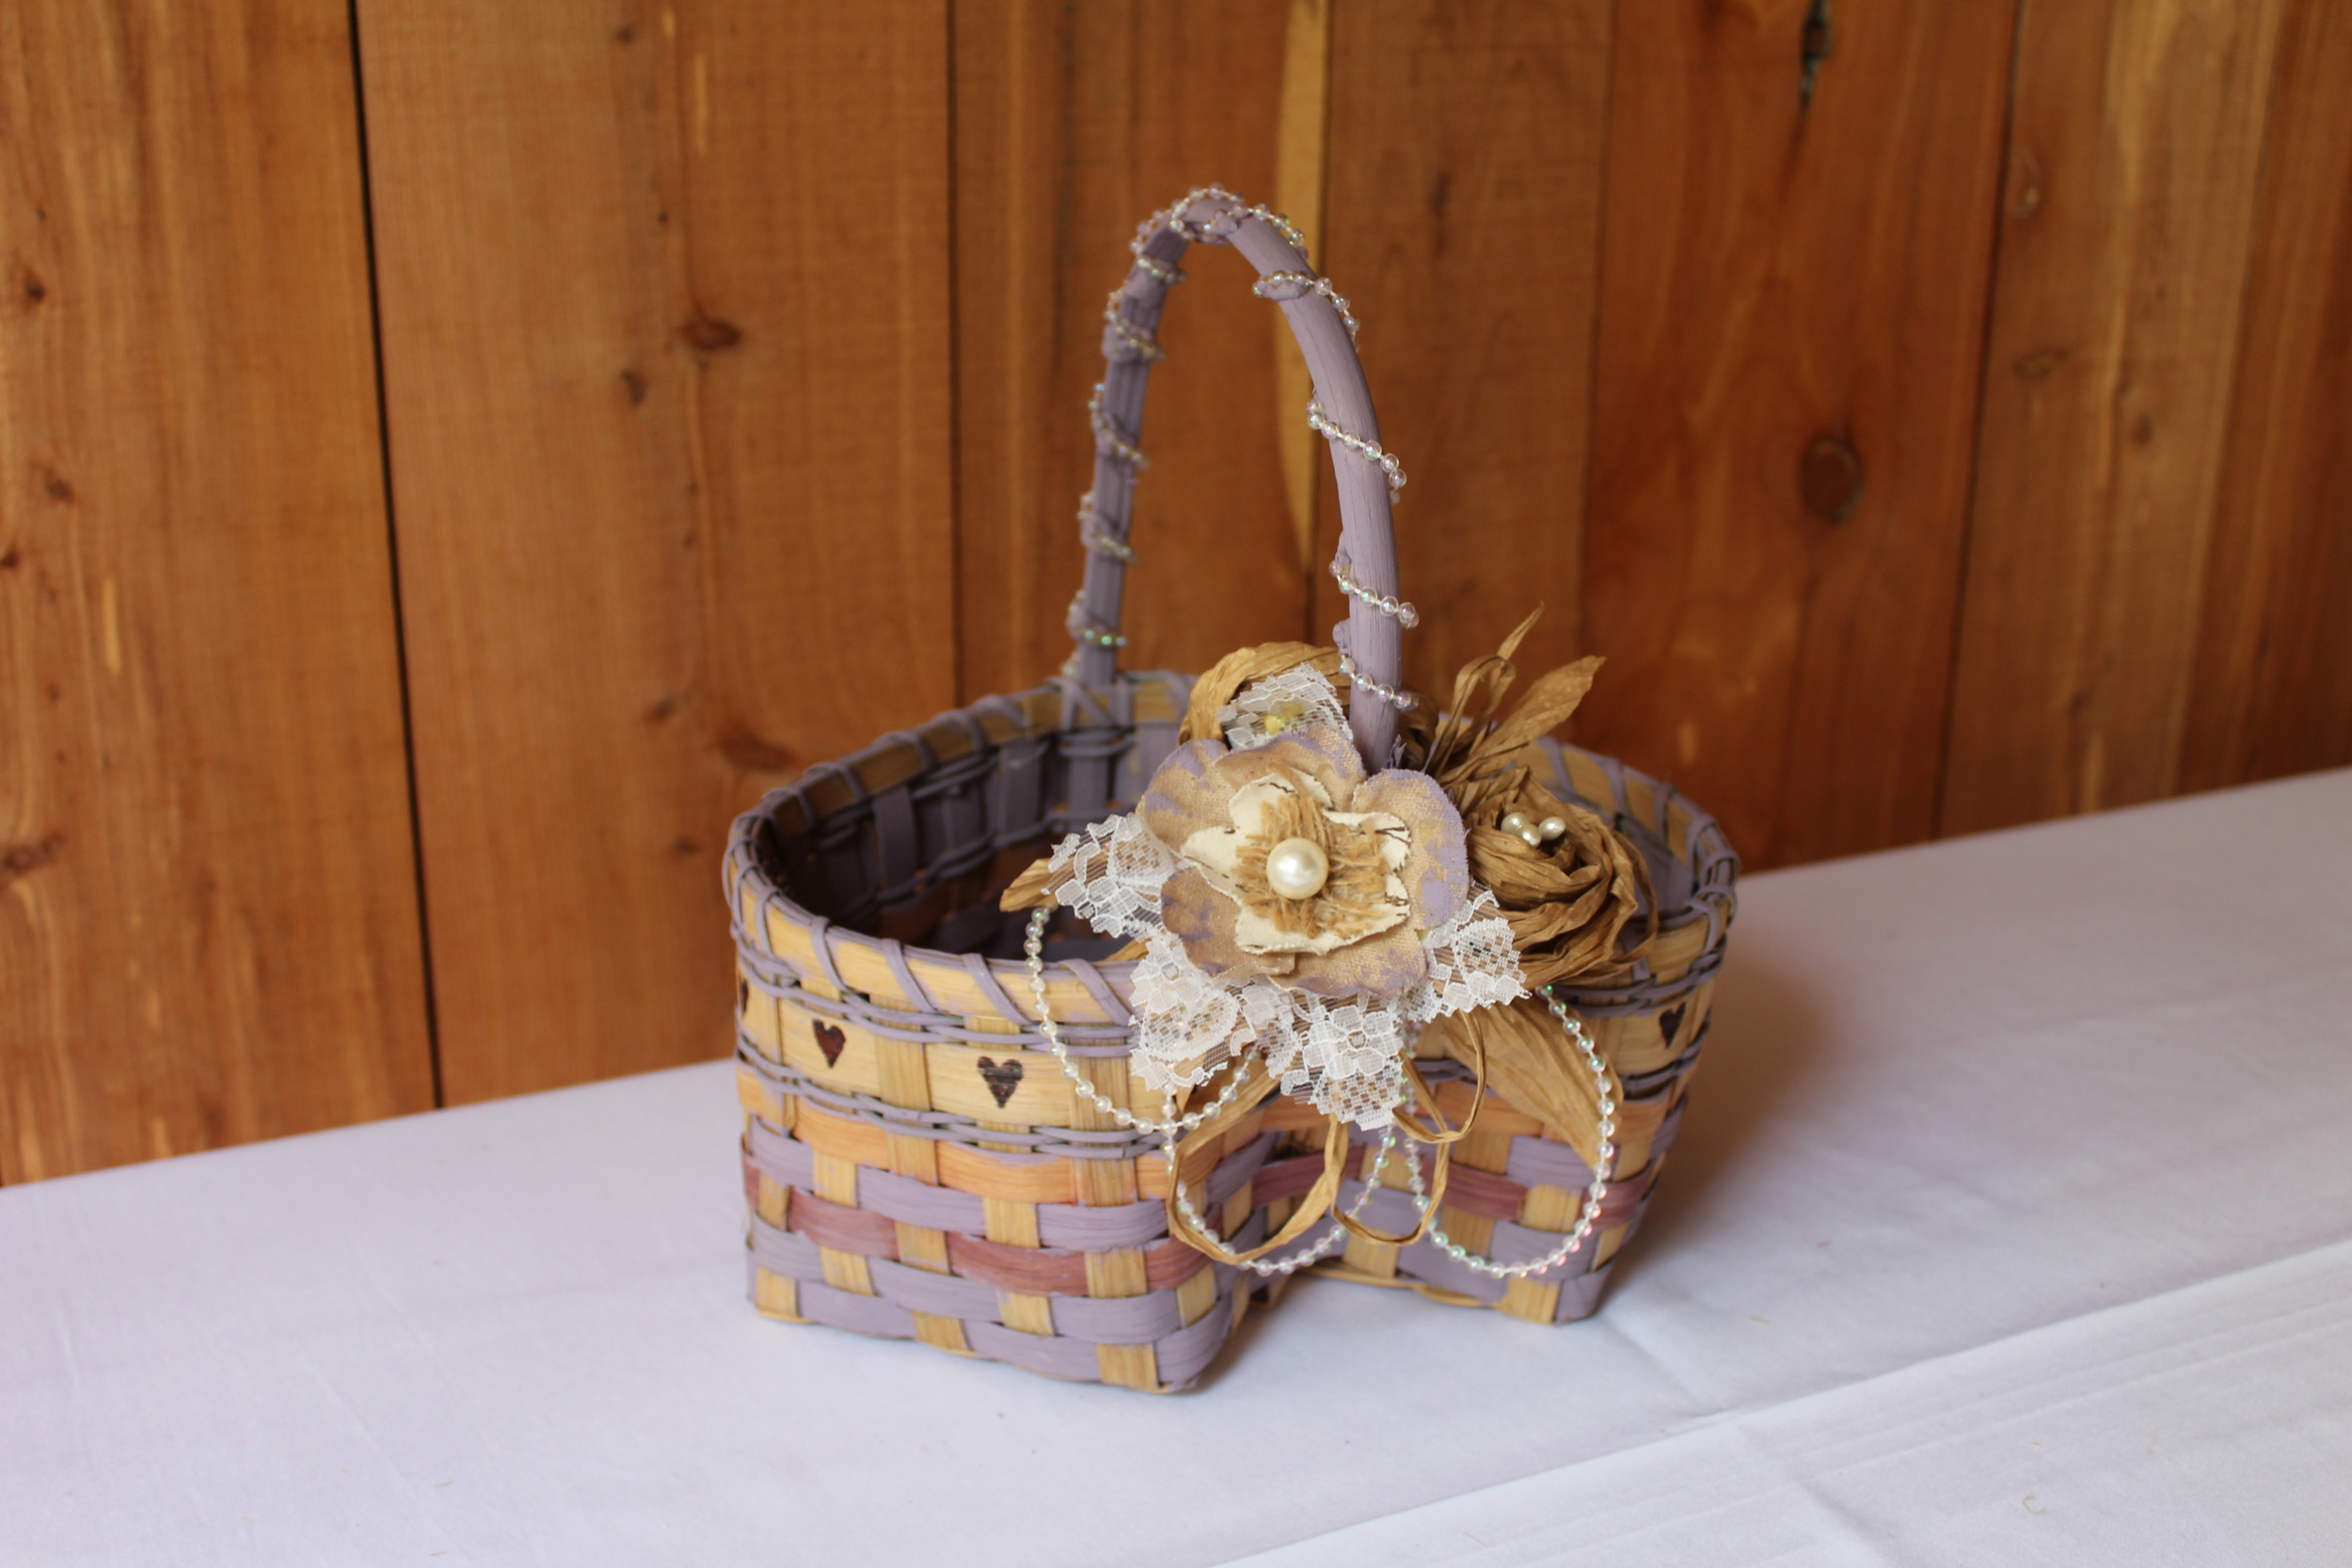 #62 - Purple Basket